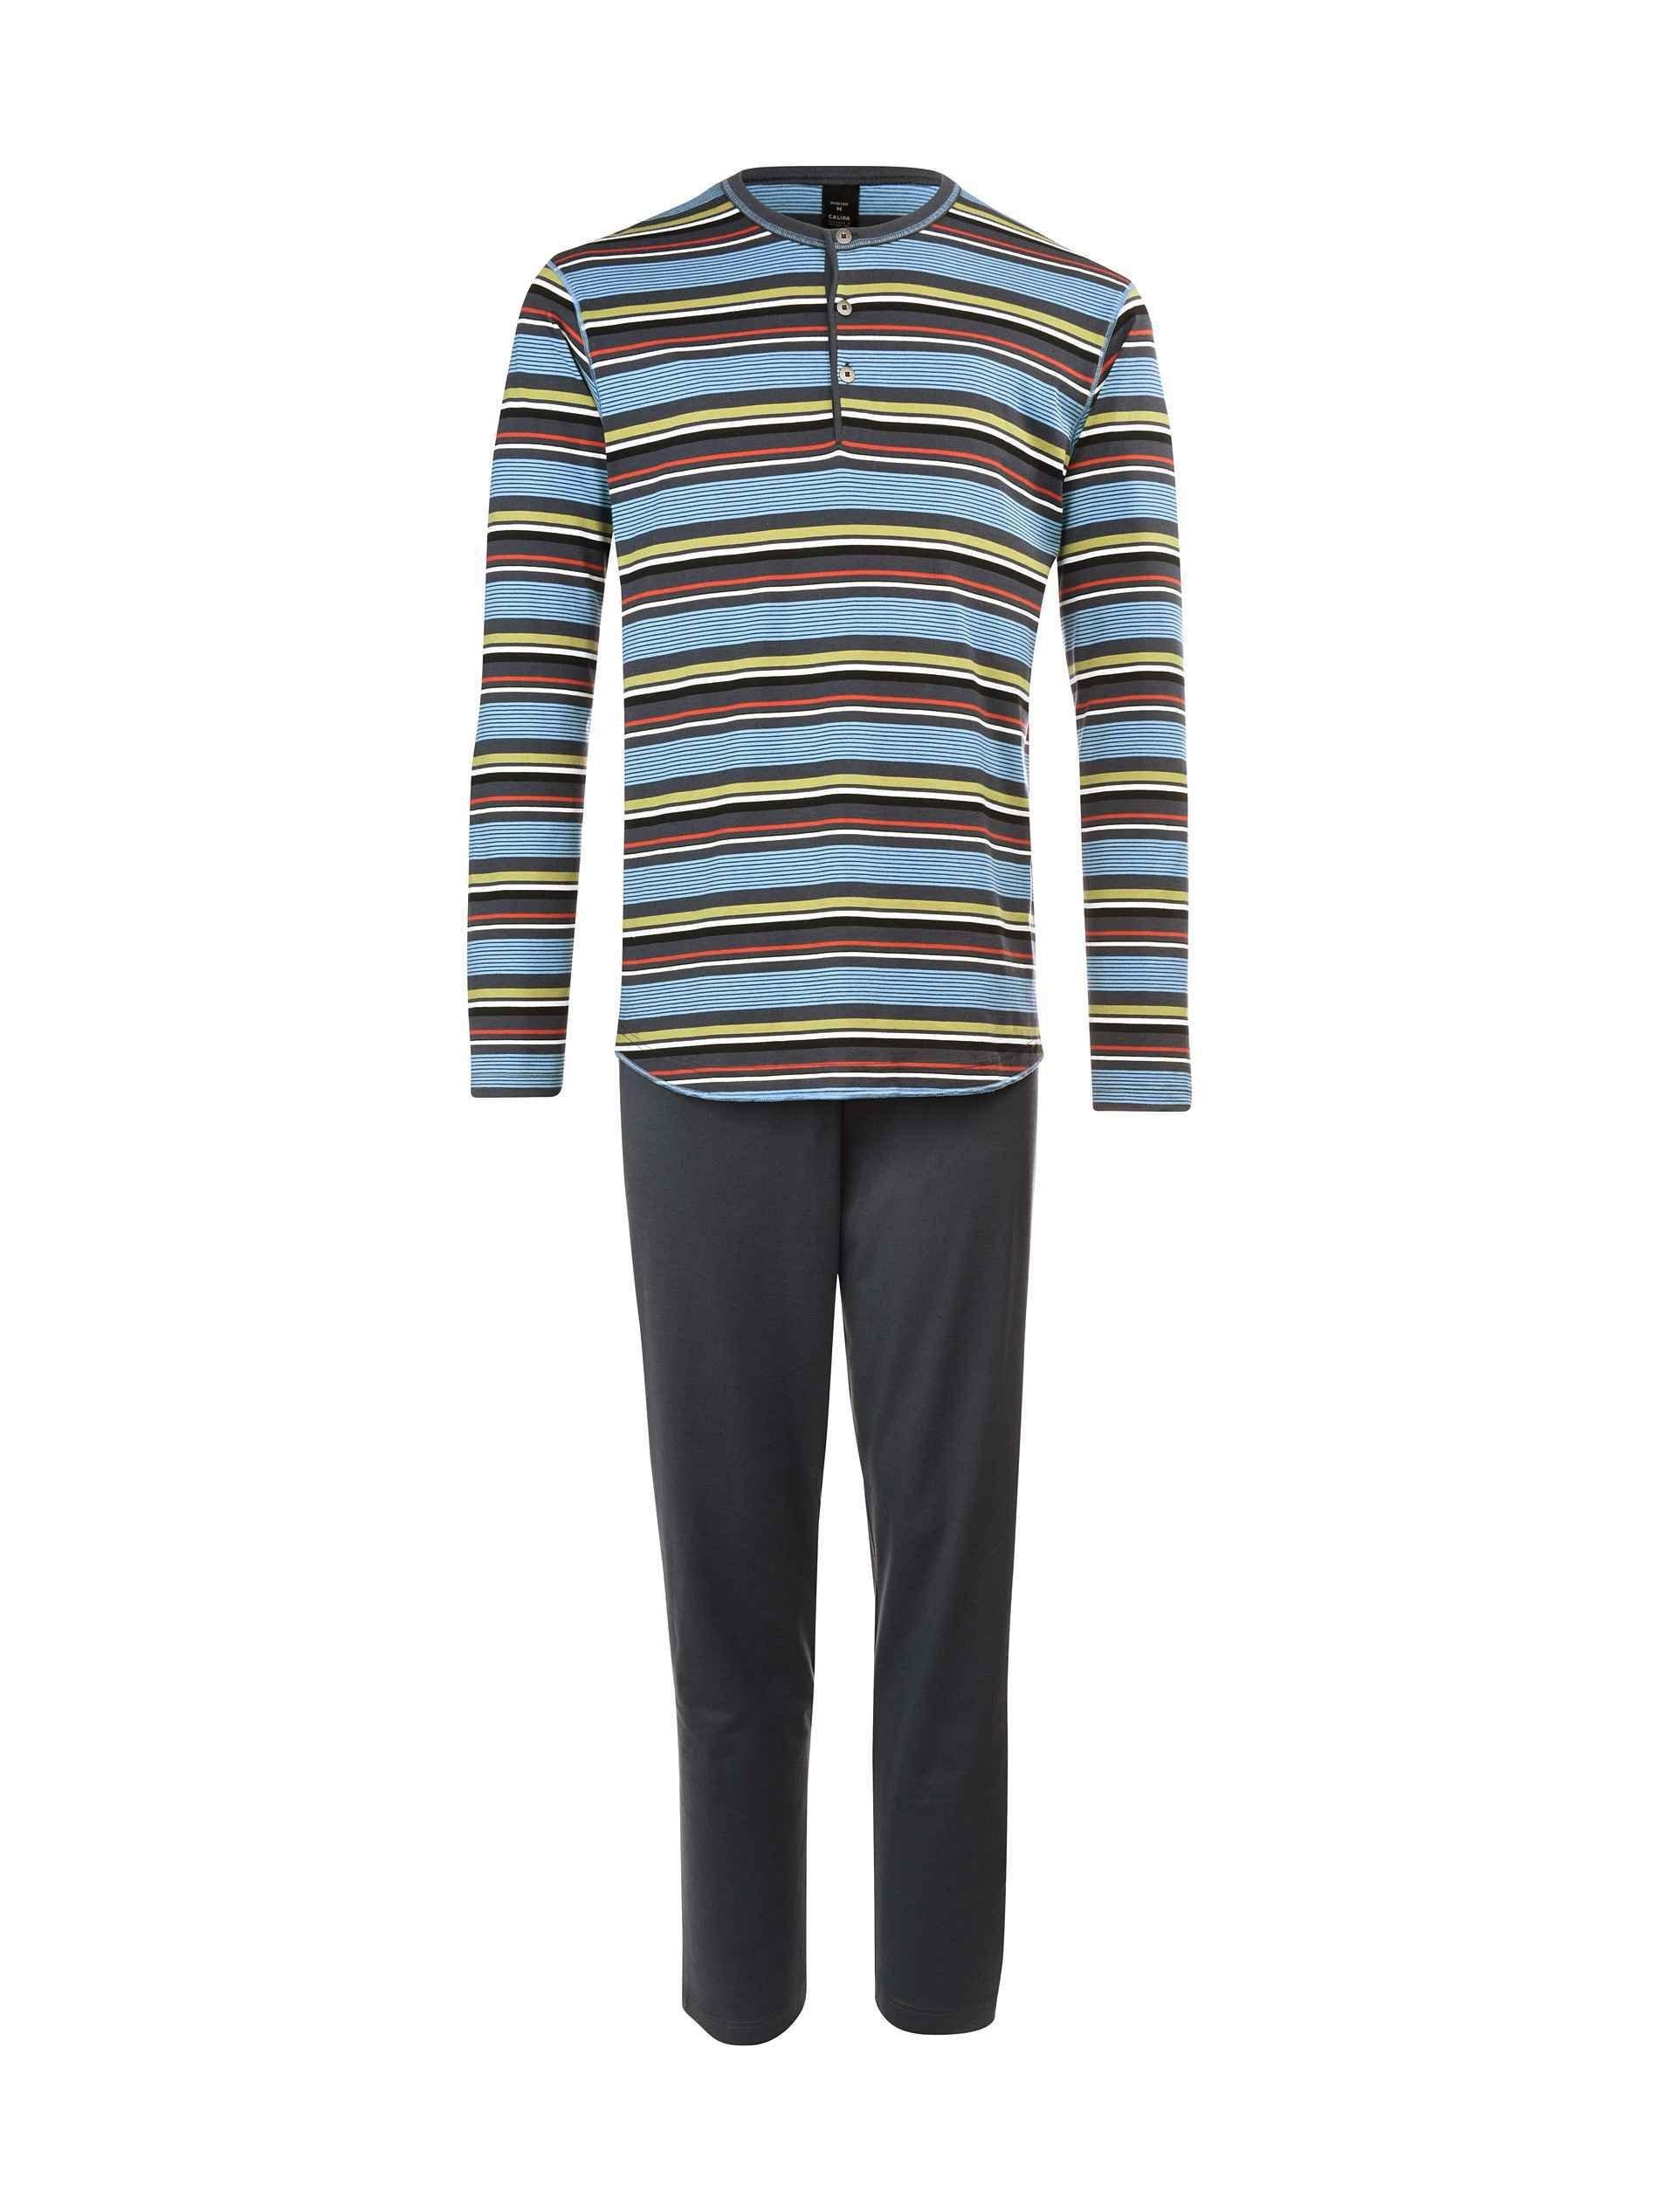 CALIDA mens 100% cotton knit Brooklyn pajamas set 47162/989 multi striped top (X-large, 989-grey)